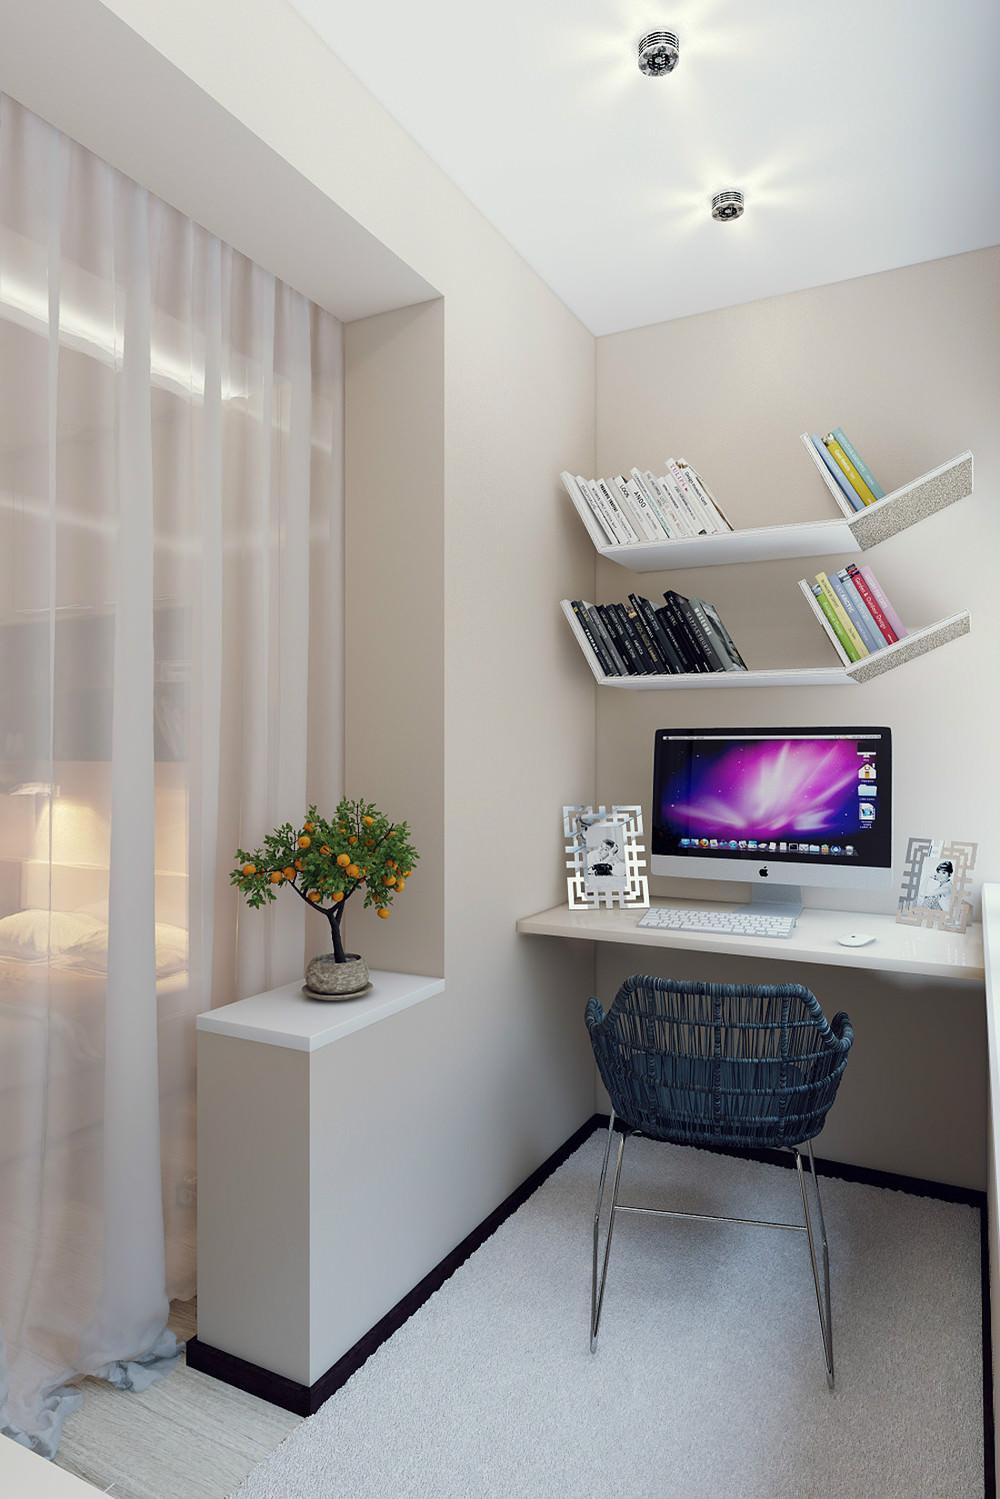 Комната совмещенная с лоджией дизайн фото..